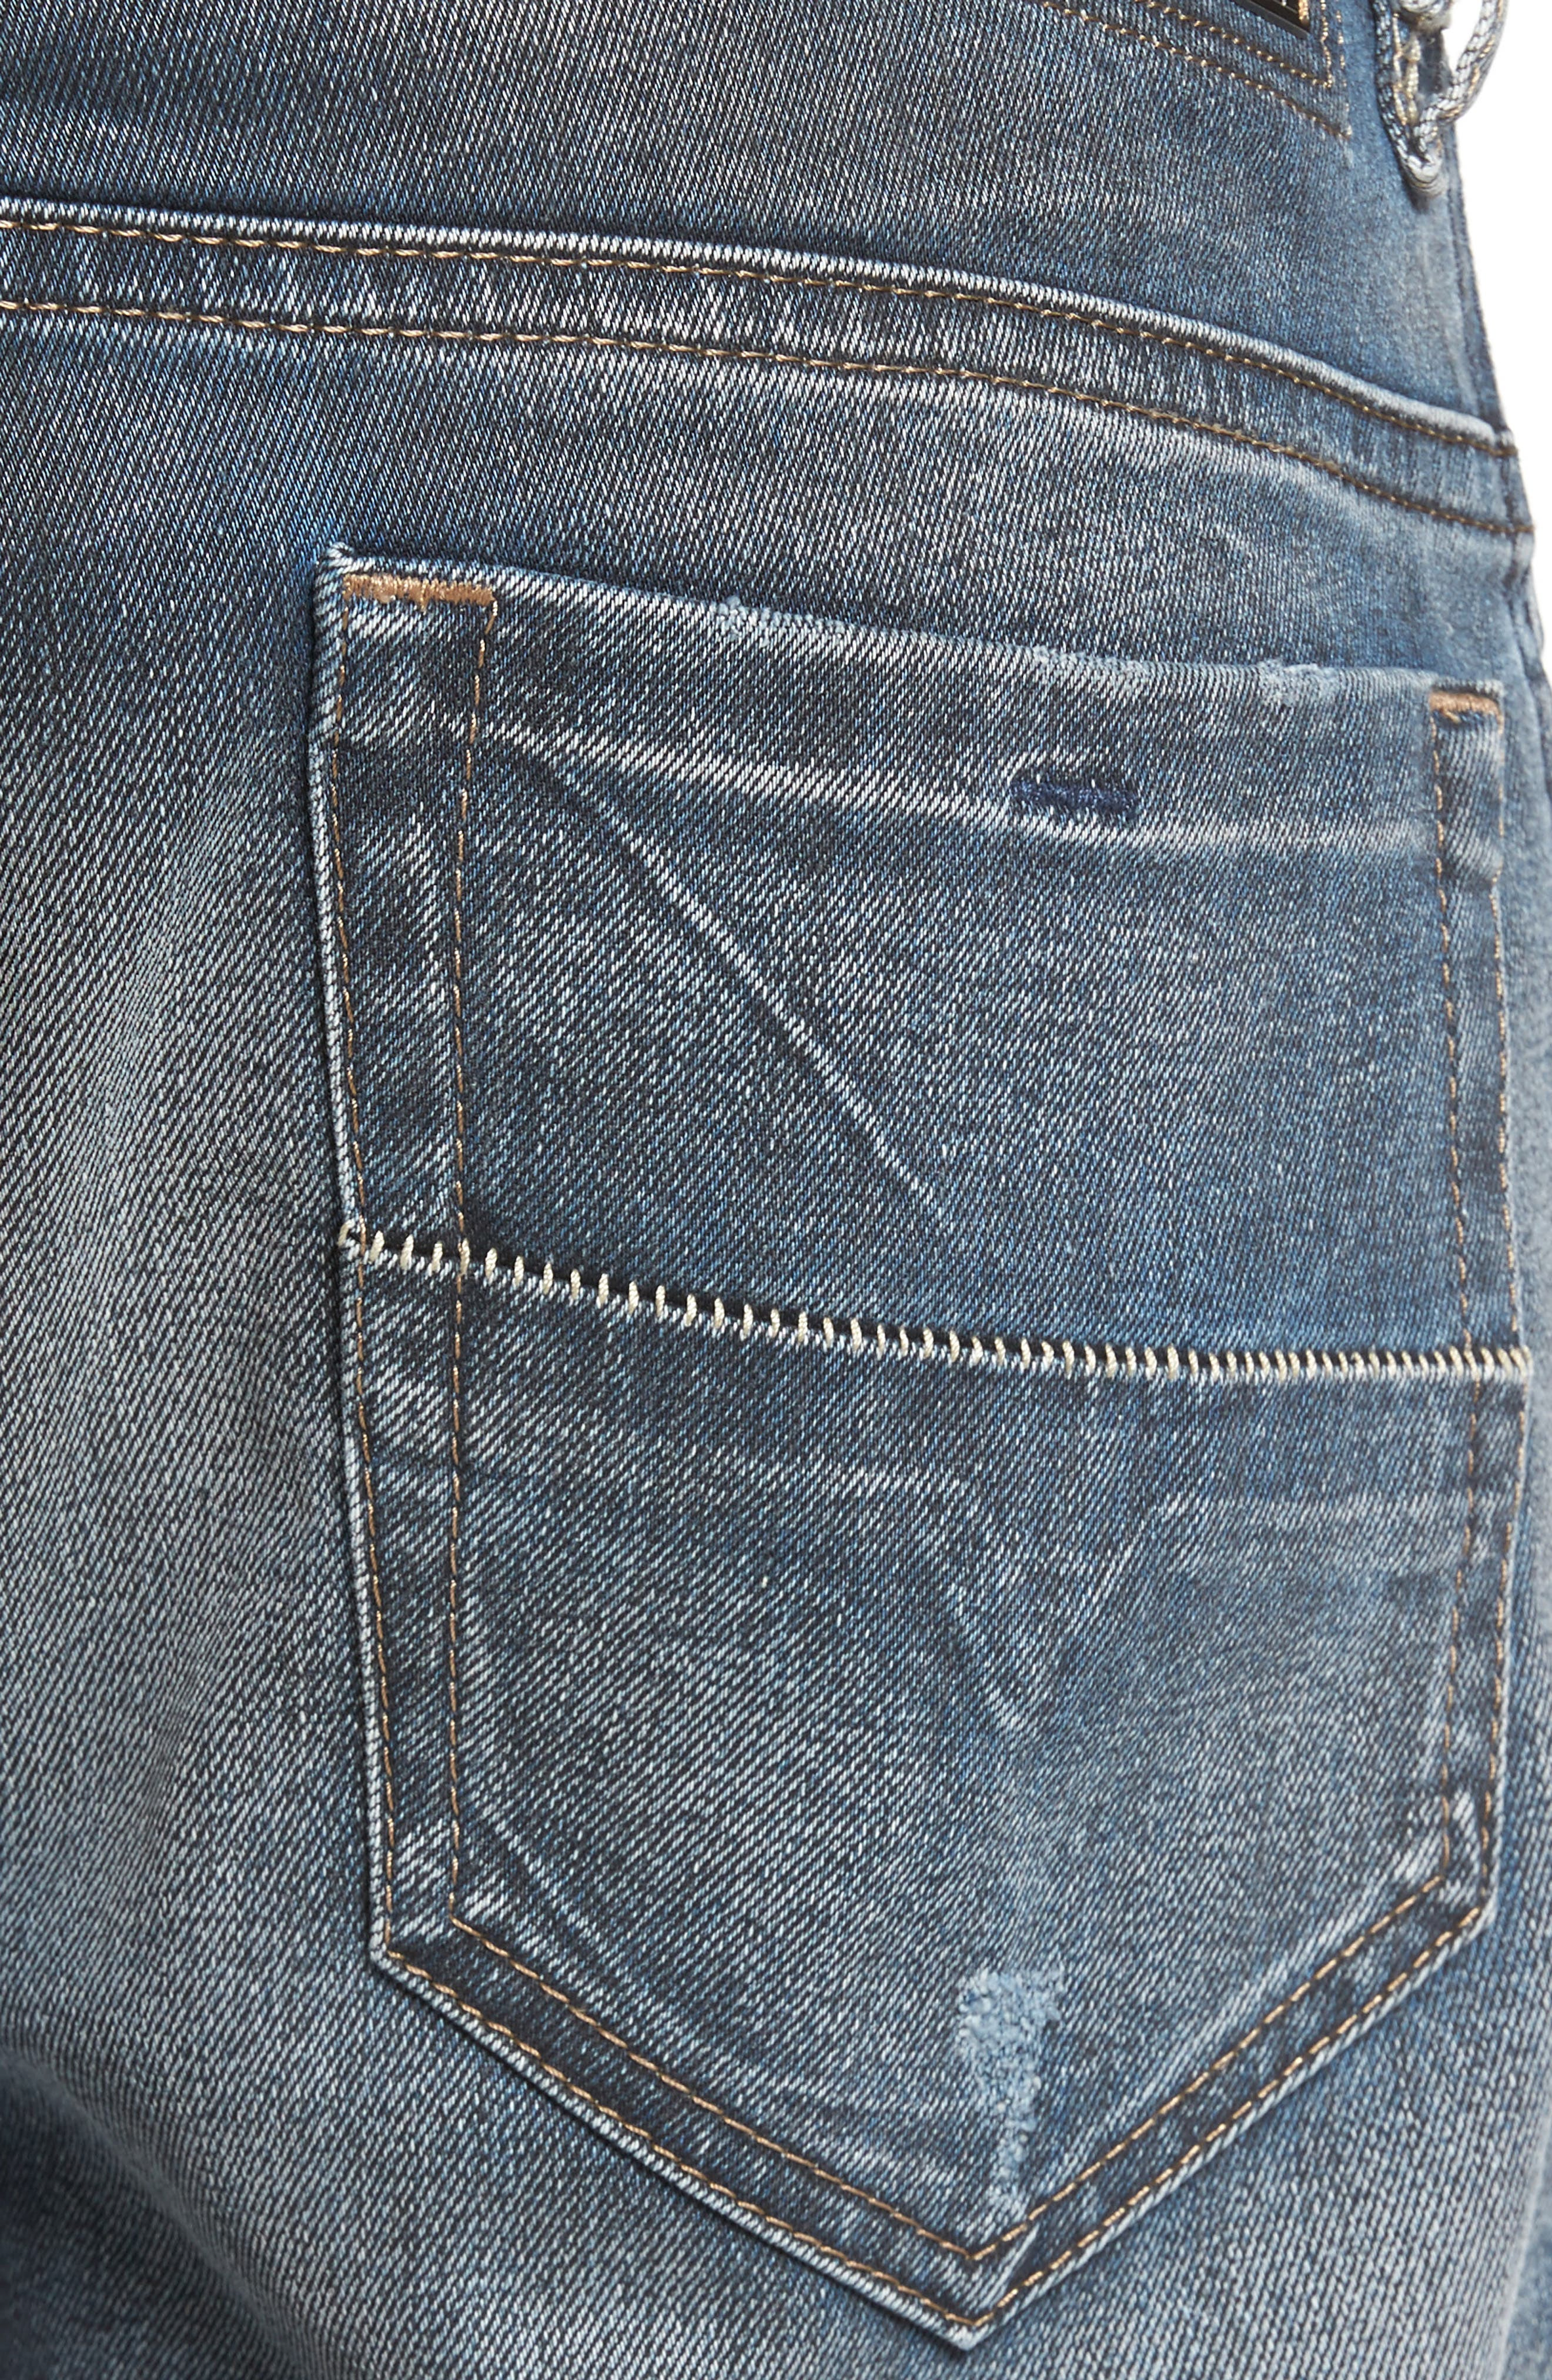 Thommer Slim Fit Jeans,                             Alternate thumbnail 4, color,                             400